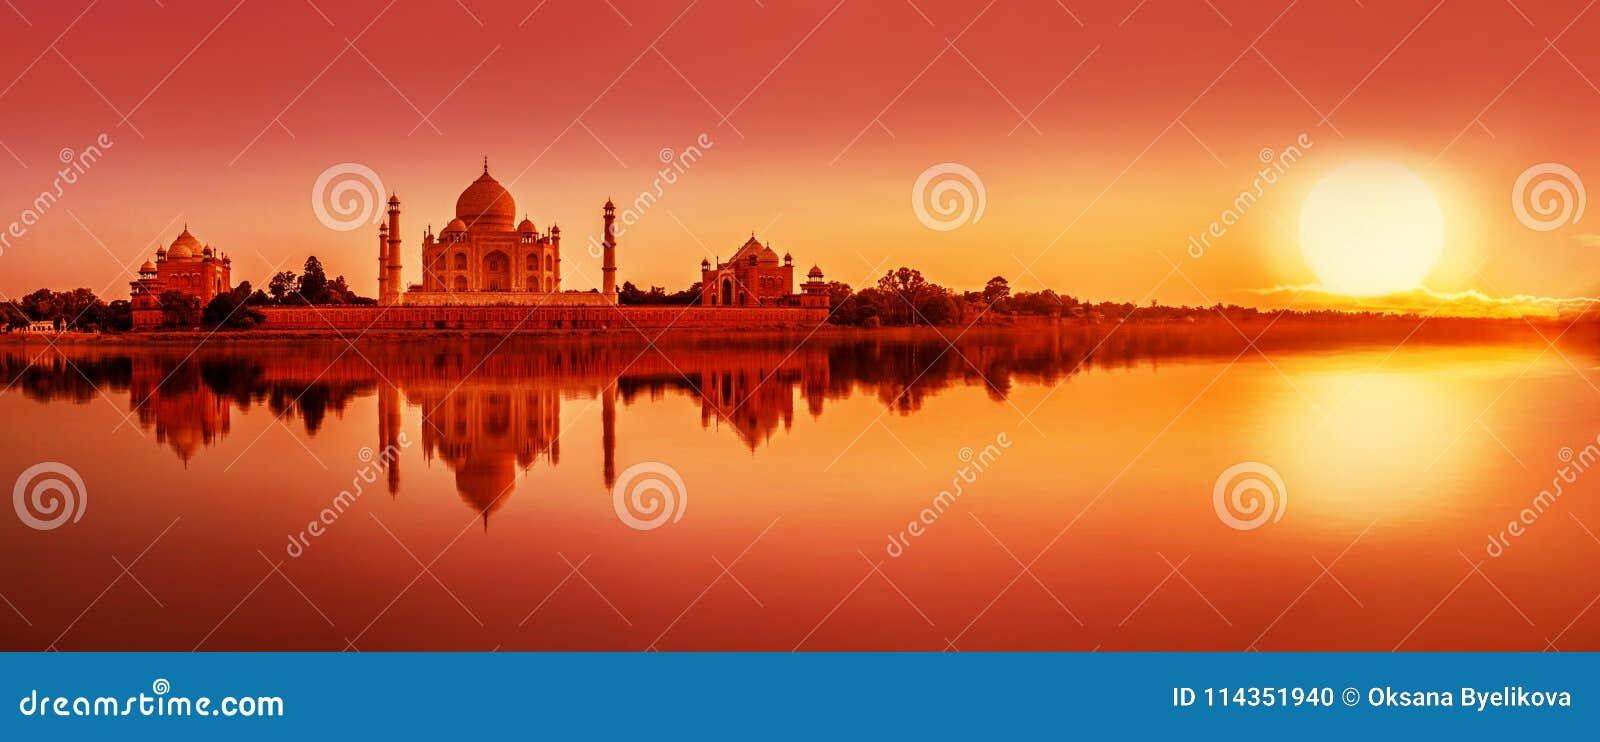 Тадж-Махал во время захода солнца в Агре, Индии